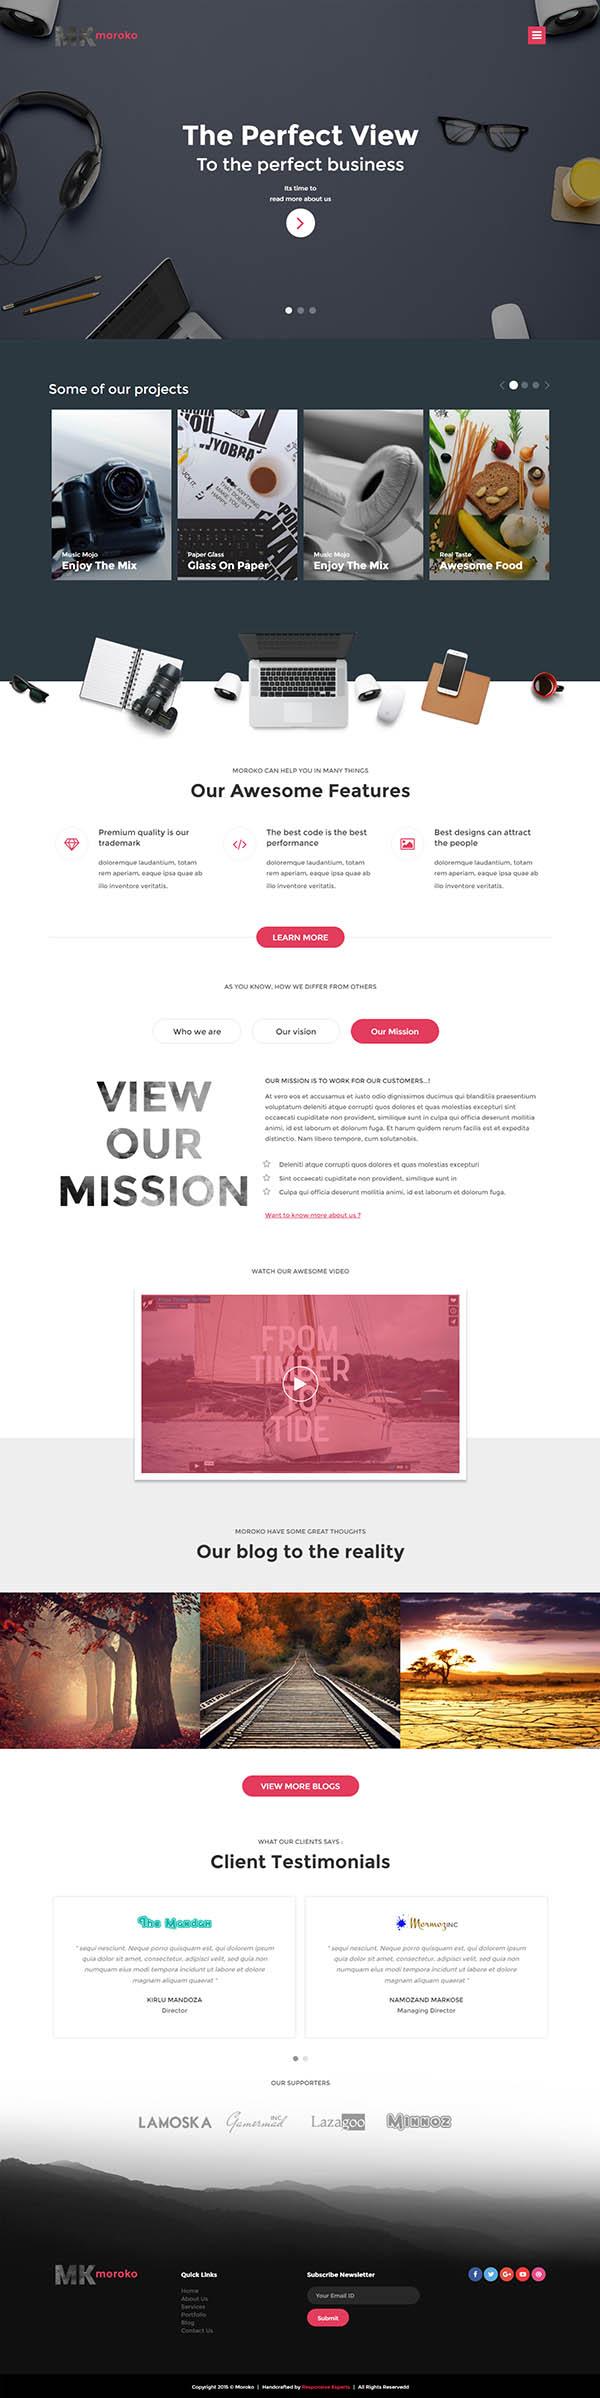 Moroko : Creative Bootstrap Responsive WordPress Theme